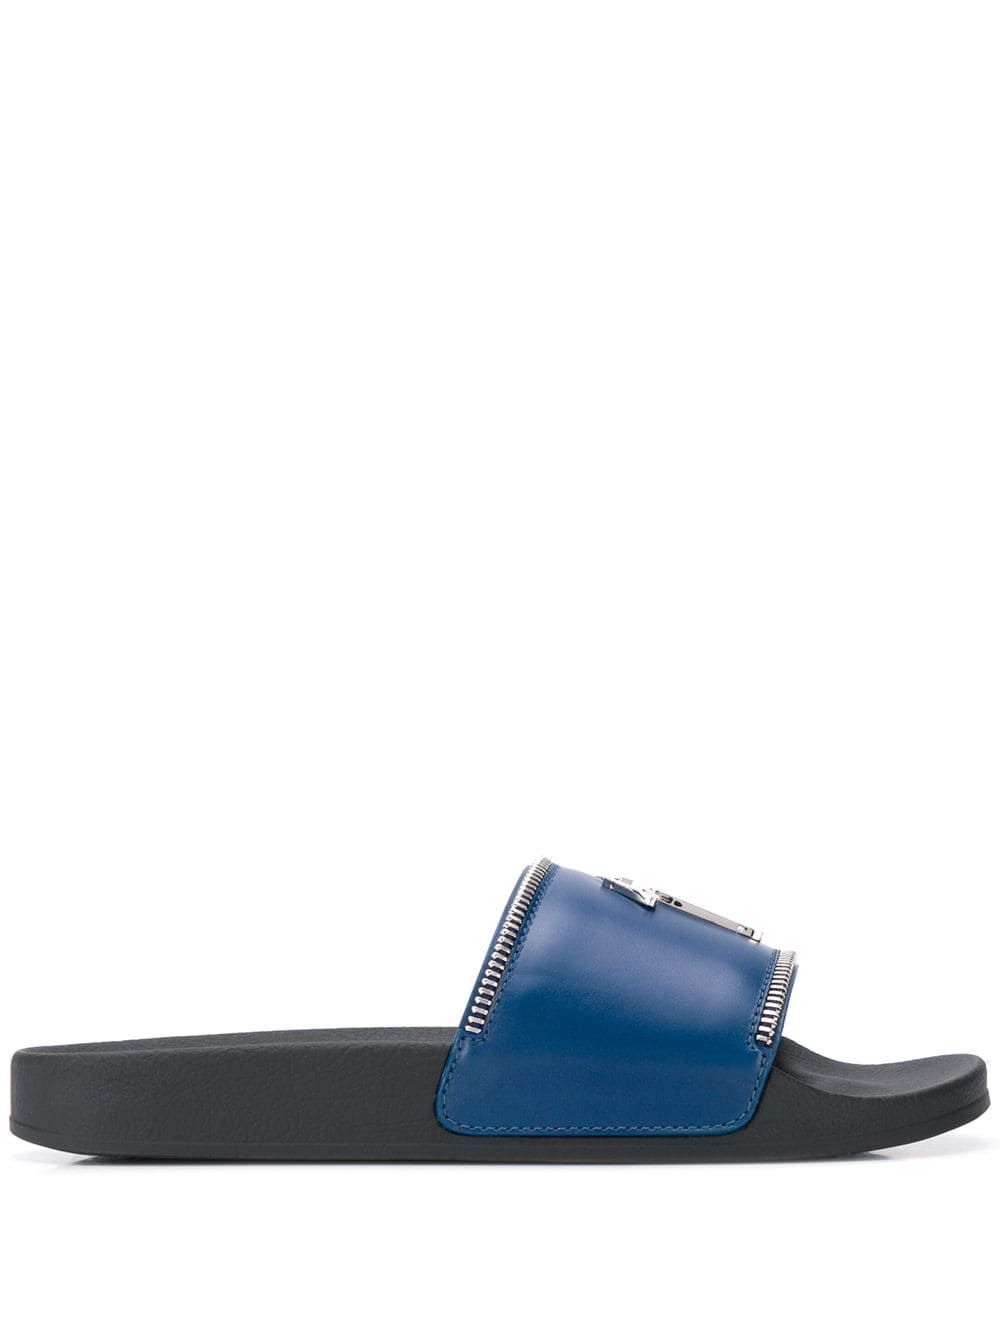 db690700a GIUSEPPE ZANOTTI GIUSEPPE ZANOTTI BRETT ZIP SLIDES - BLUE.  giuseppezanotti   shoes